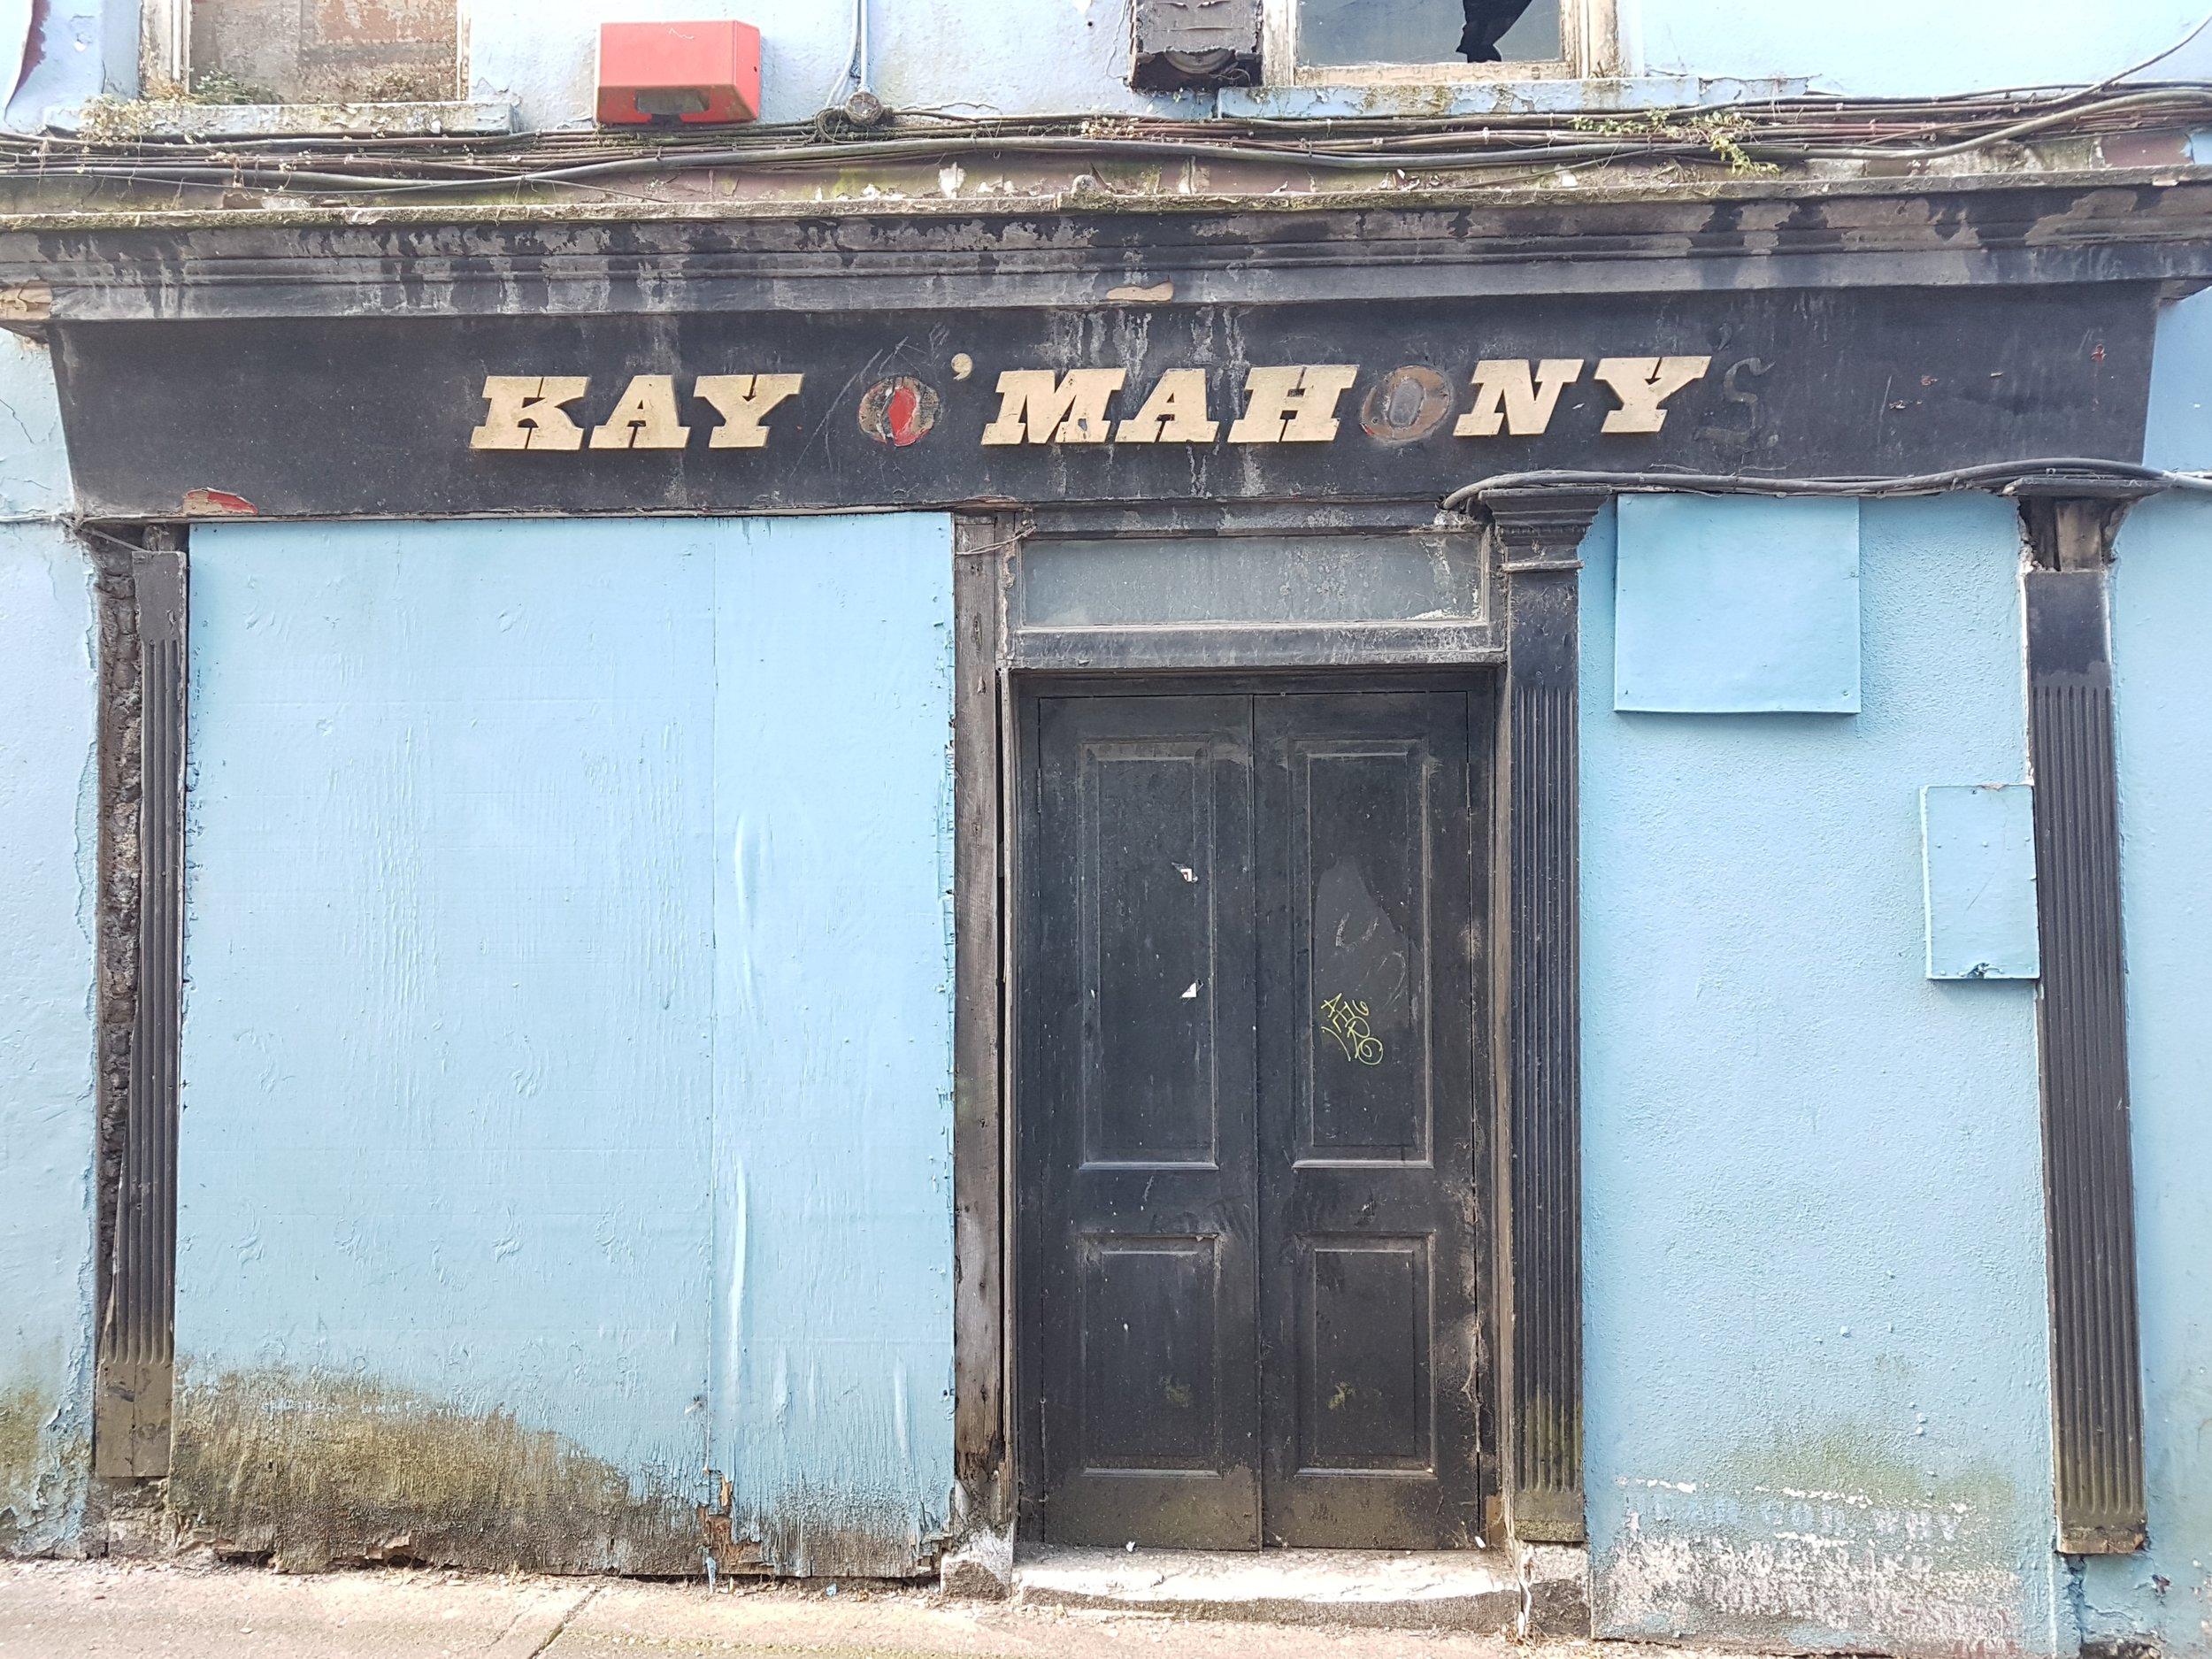 county cork. cork. ireland. irish. history. city. house sitting. old. travel. travel photography. travel photographer.  old pub door in cork.jpg